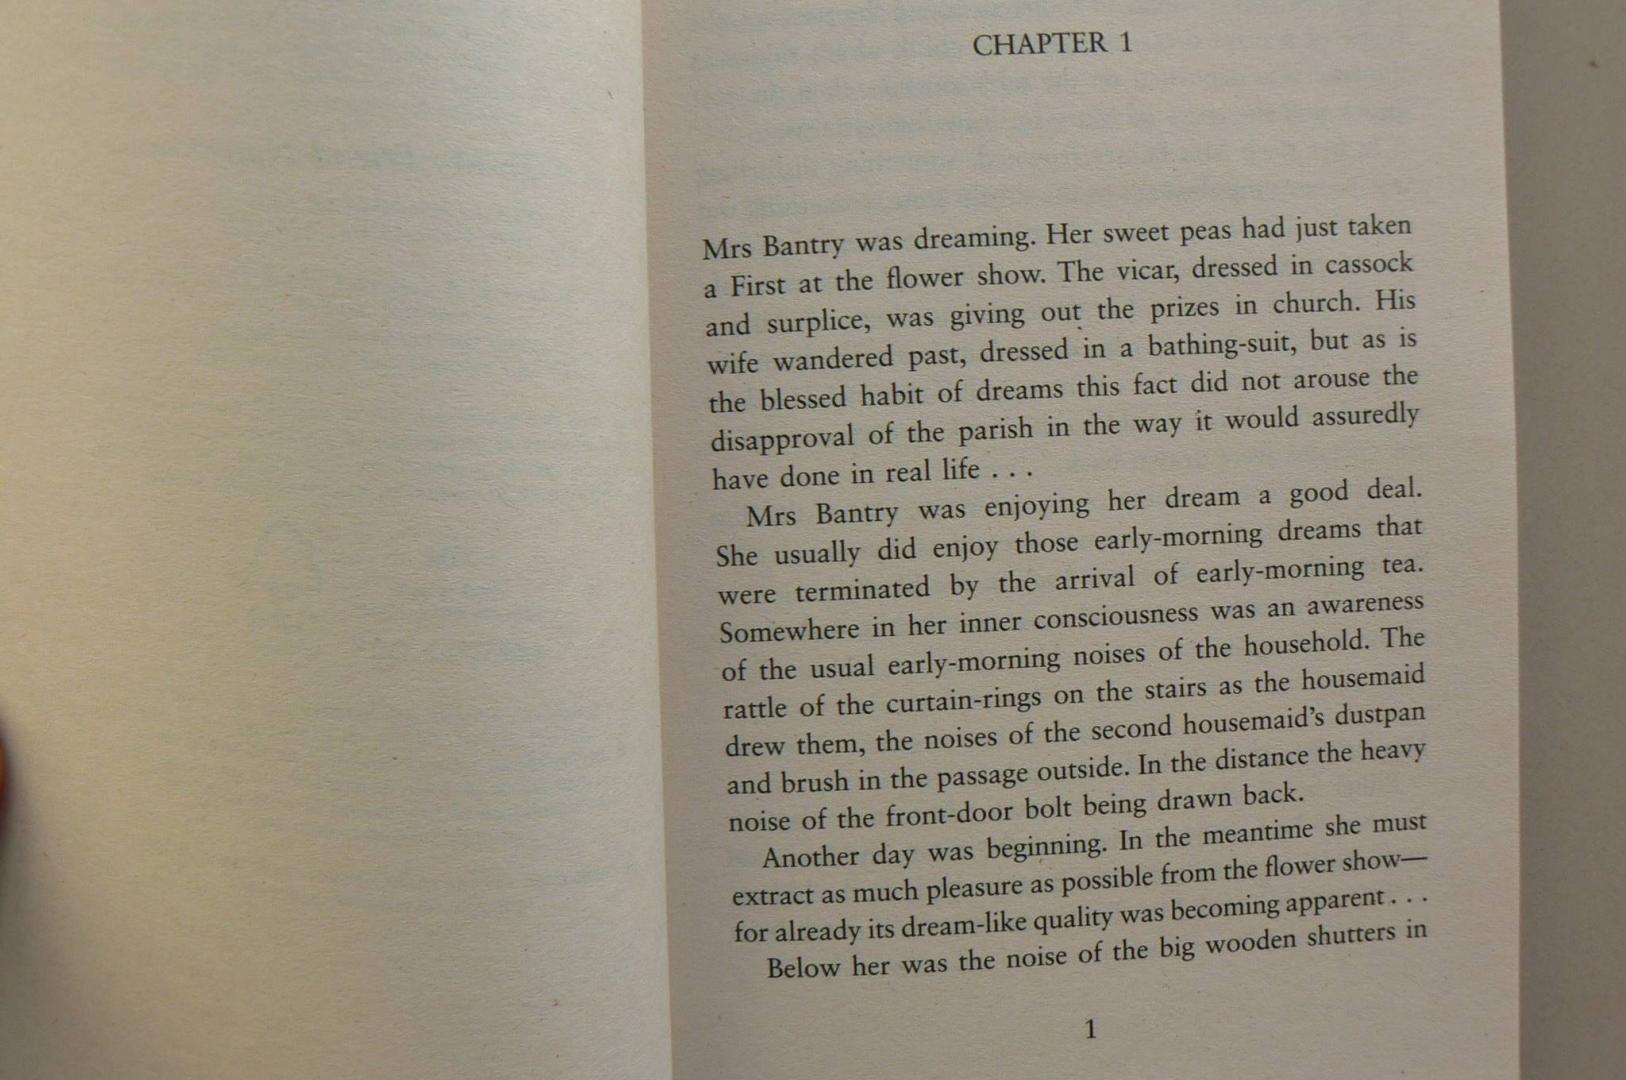 Иллюстрация 3 из 5 для The Body in the Library - Agatha Christie | Лабиринт - книги. Источник: Лидия